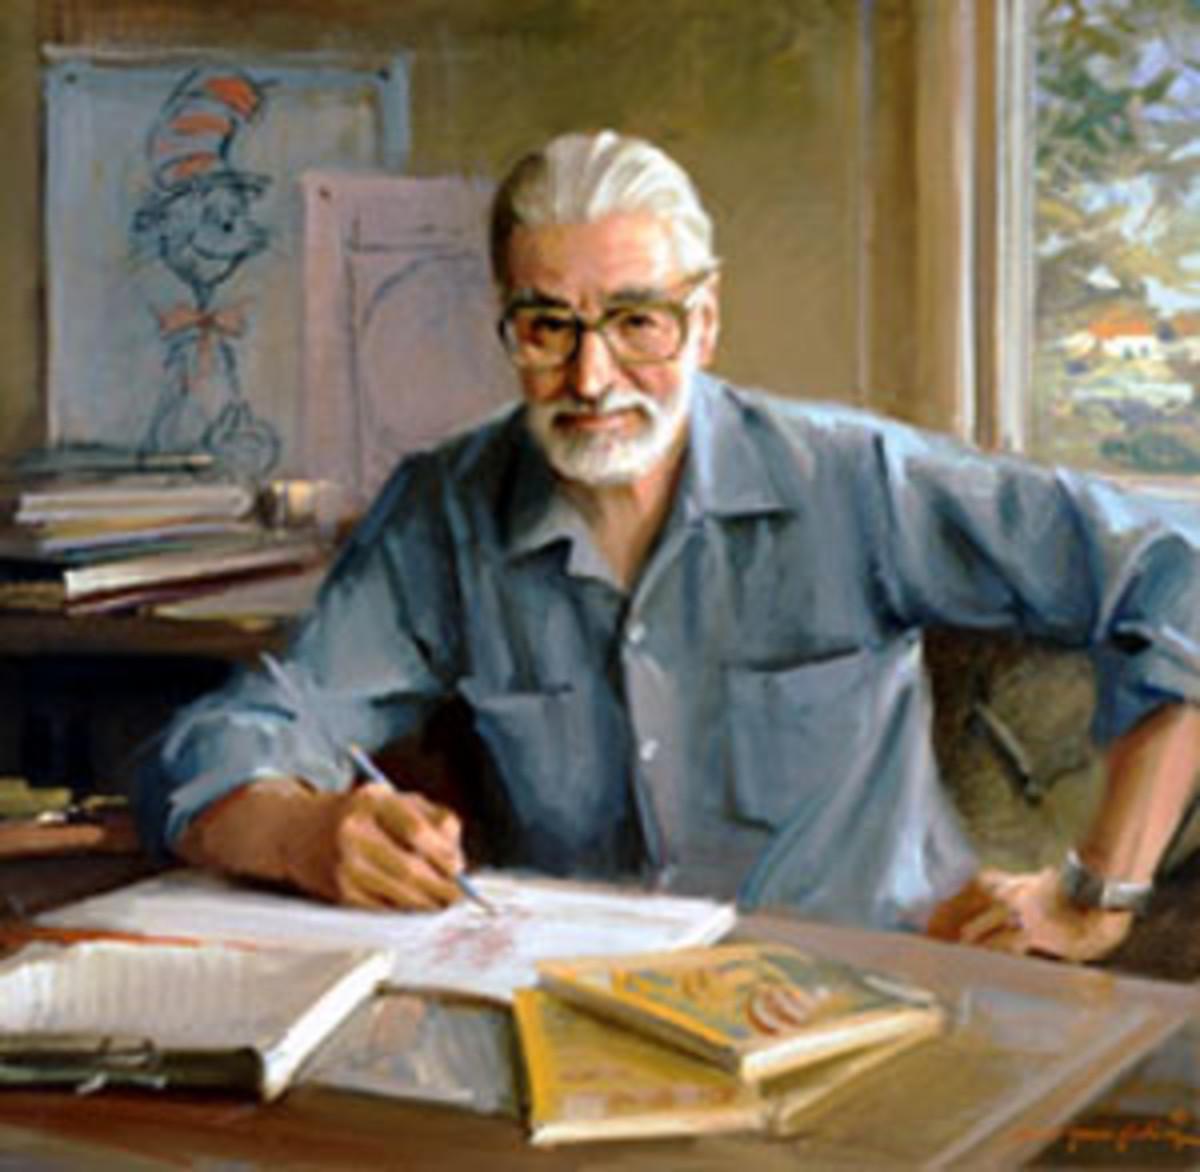 Dr. Seuss: Legendary Children's Book Author